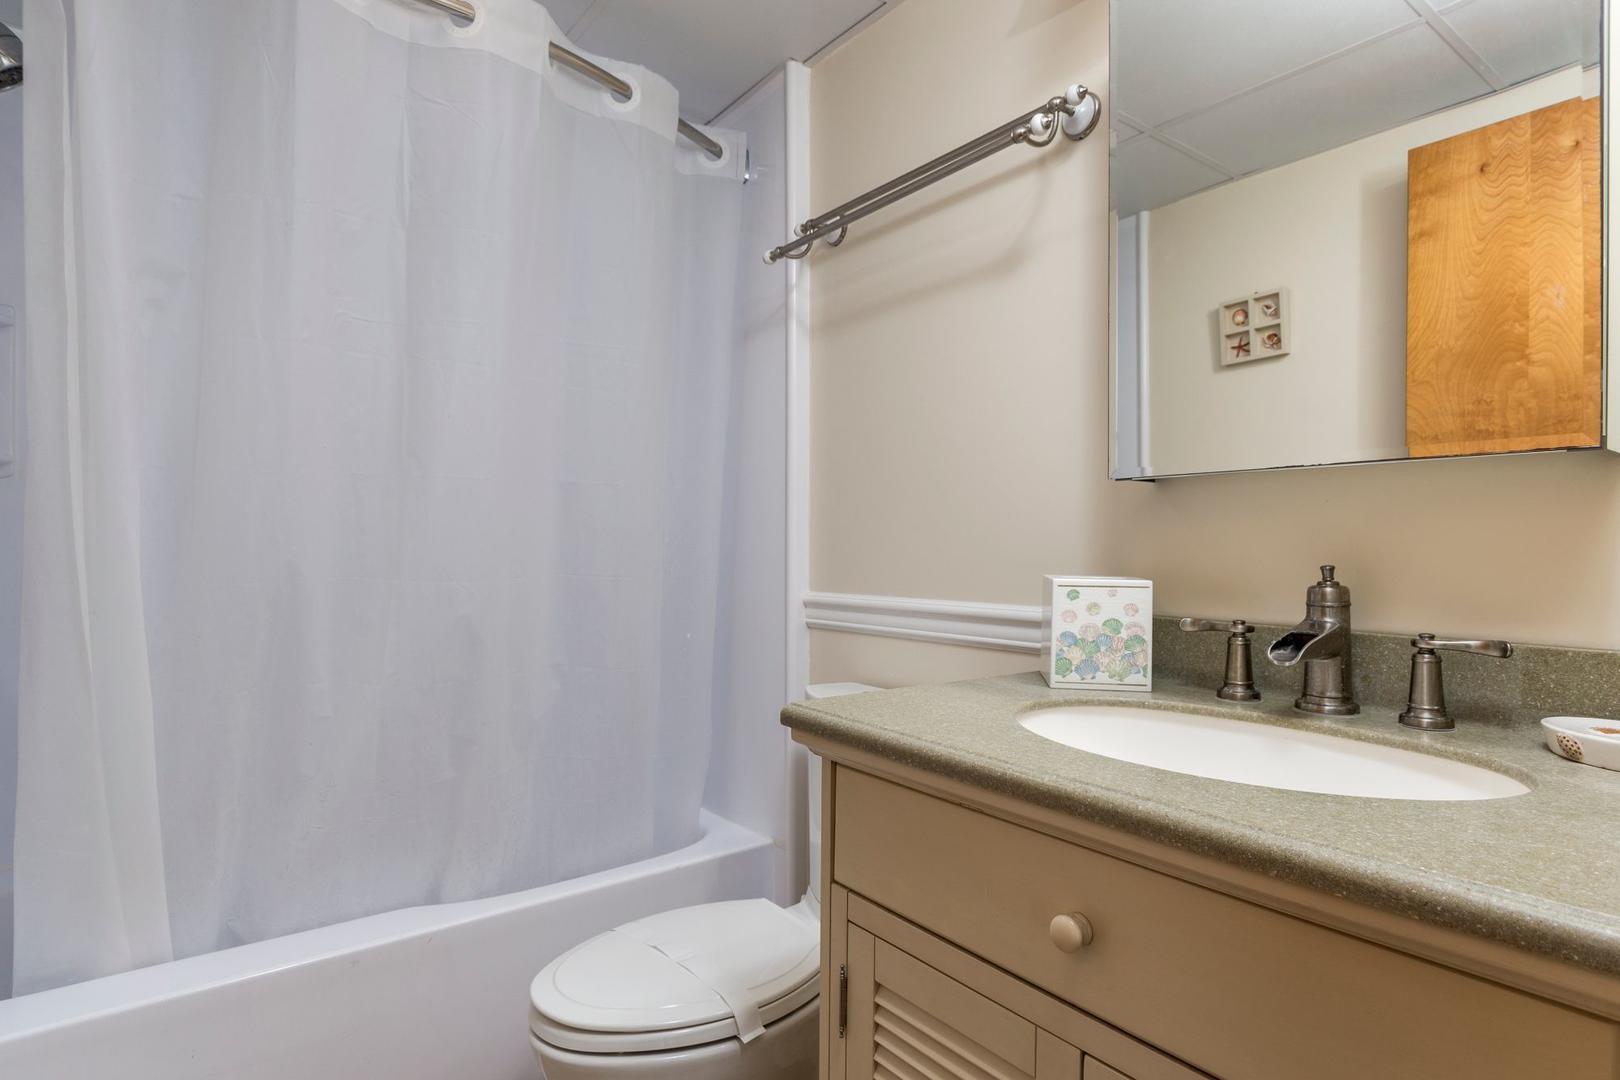 Amber Waves 101 - Bathroom 2